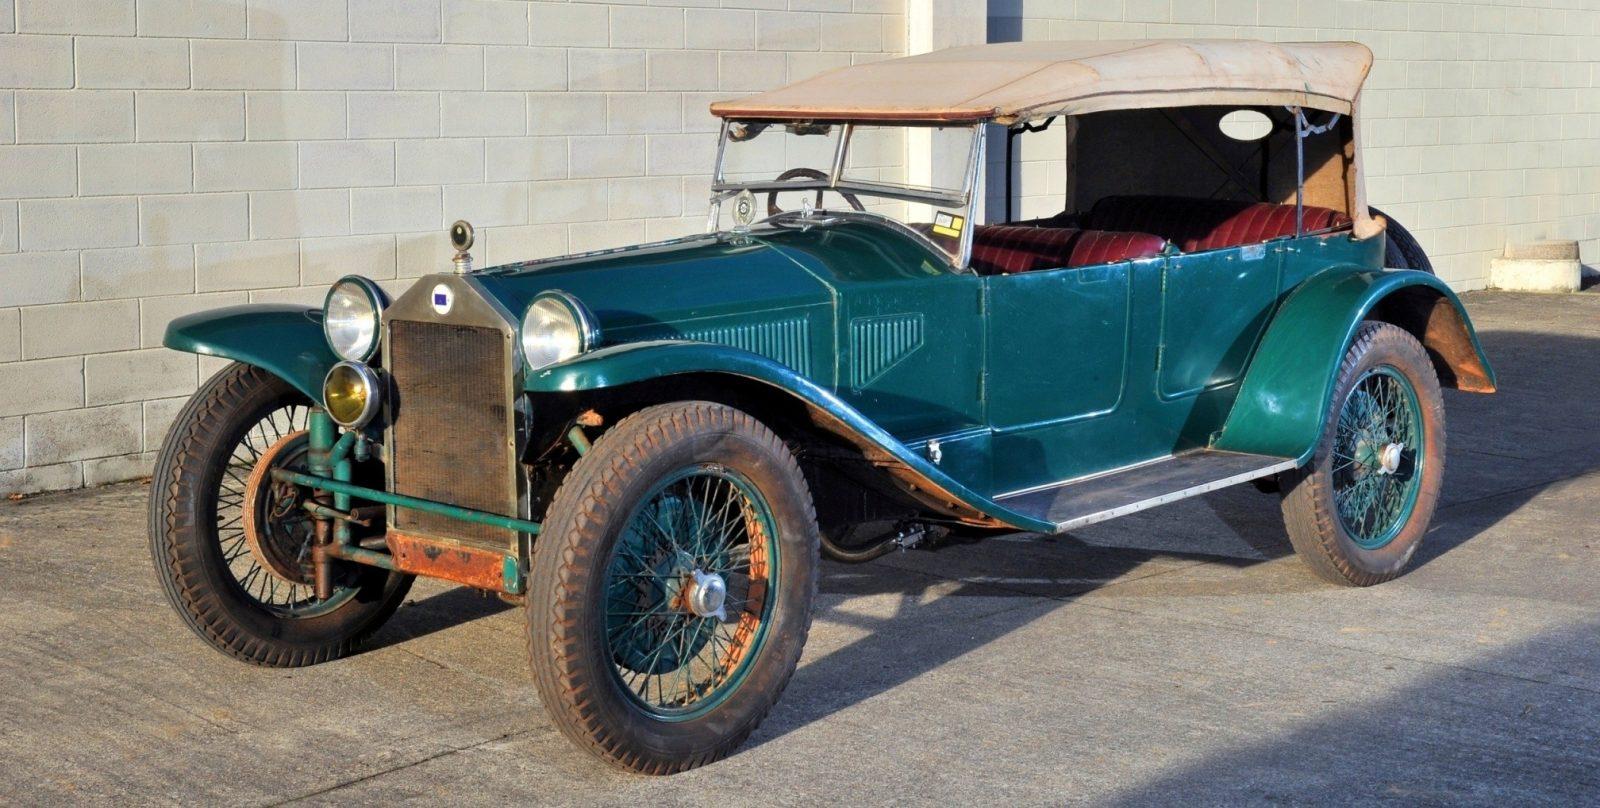 Wealth Dreams -- 1930 Lancia Lambda 8 Sports Tourer Seeks New Home -- My Home 1